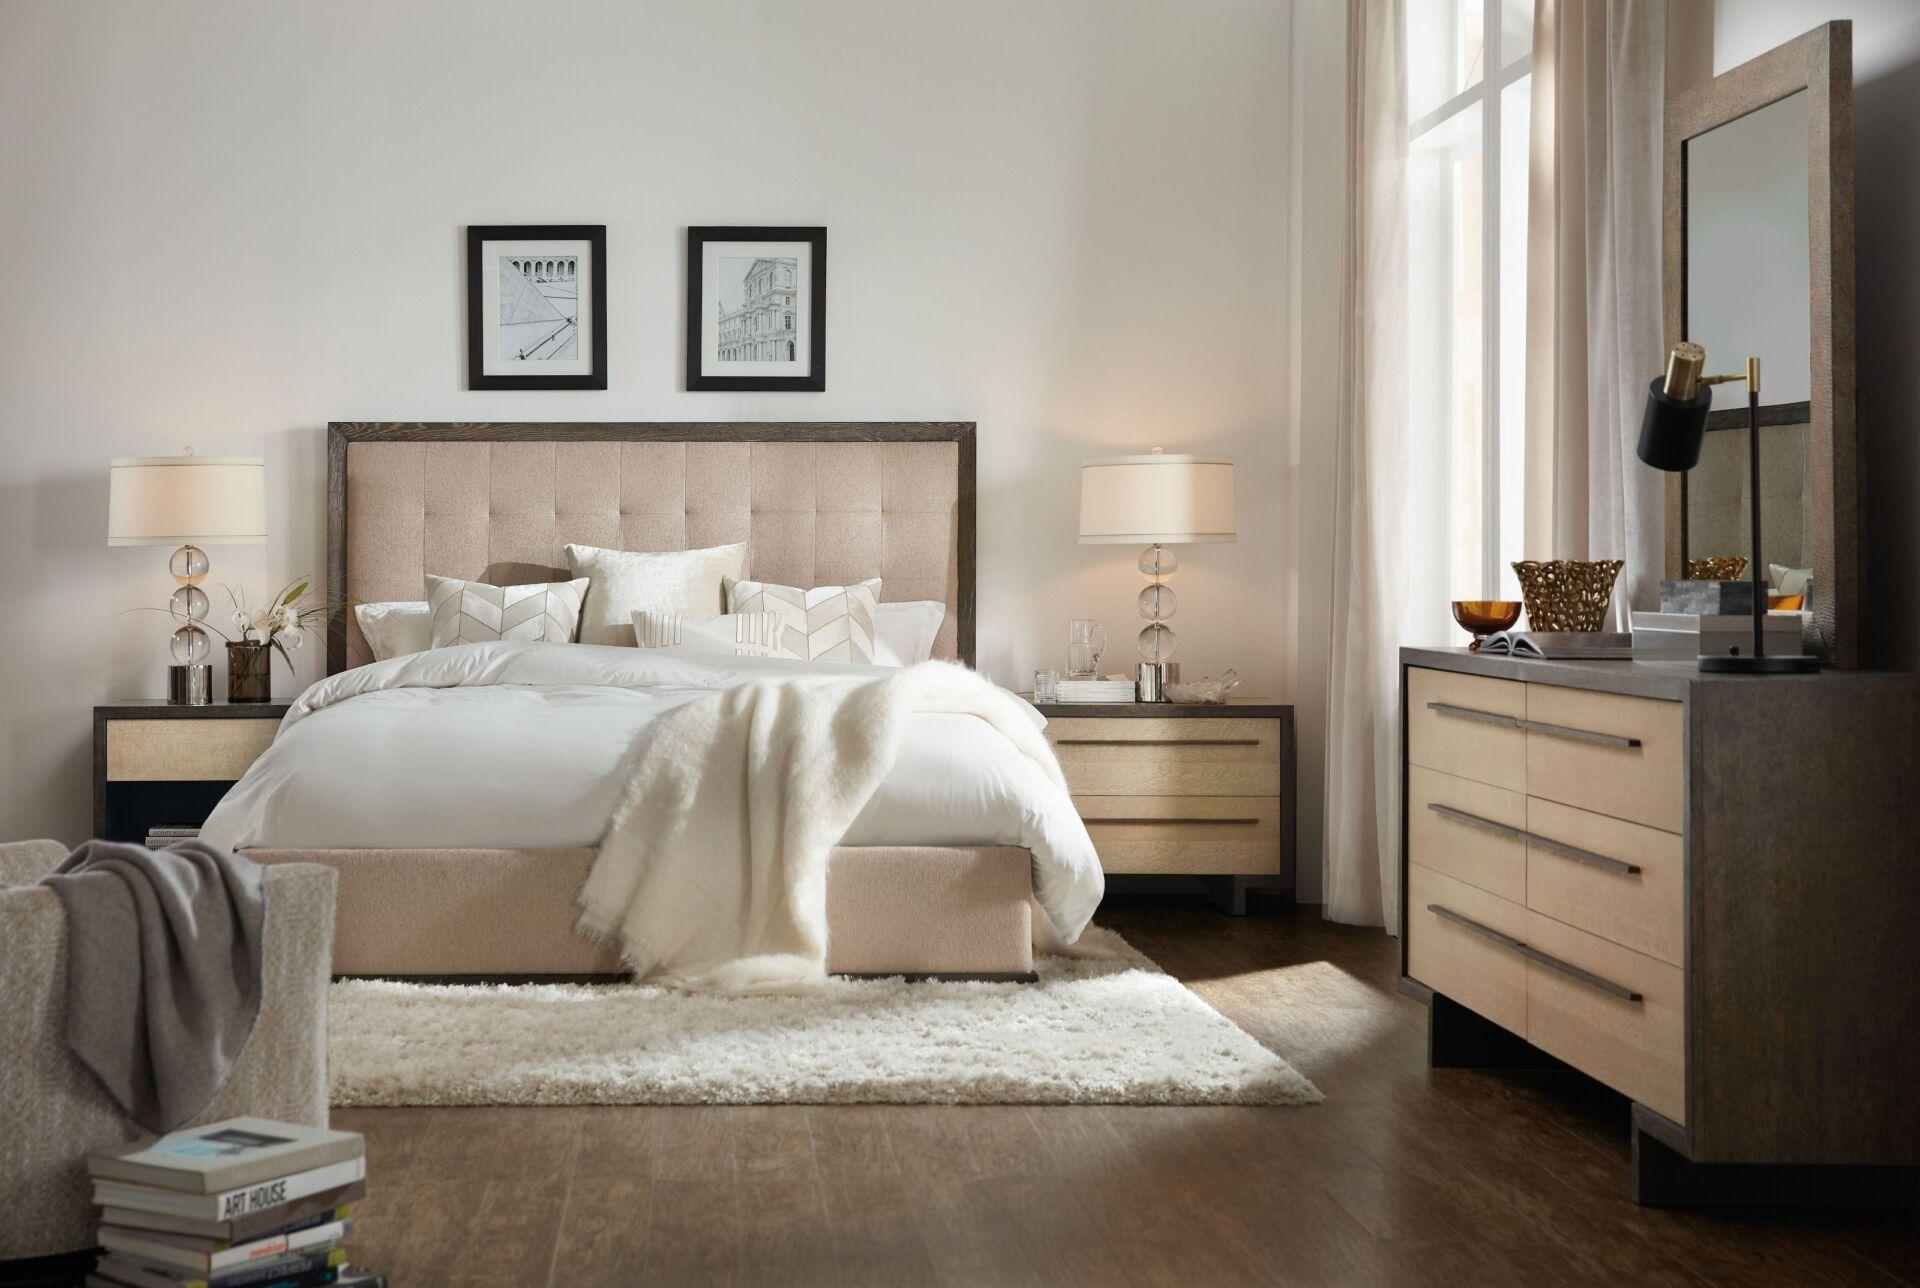 Top Furniture Brands for Luxury Bedroom Sets